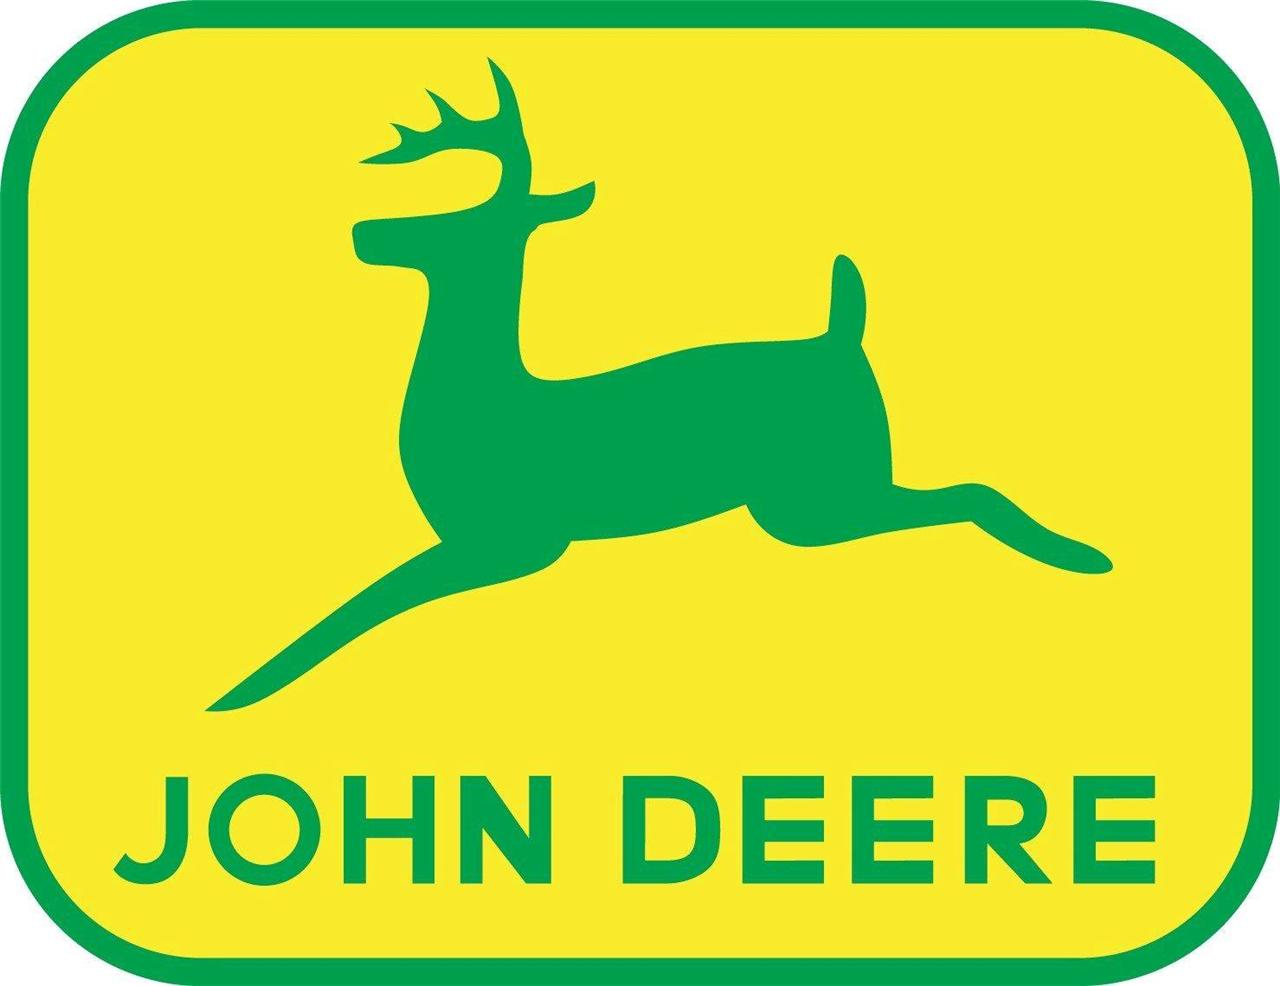 John Deere Wall Decal - Elitflat